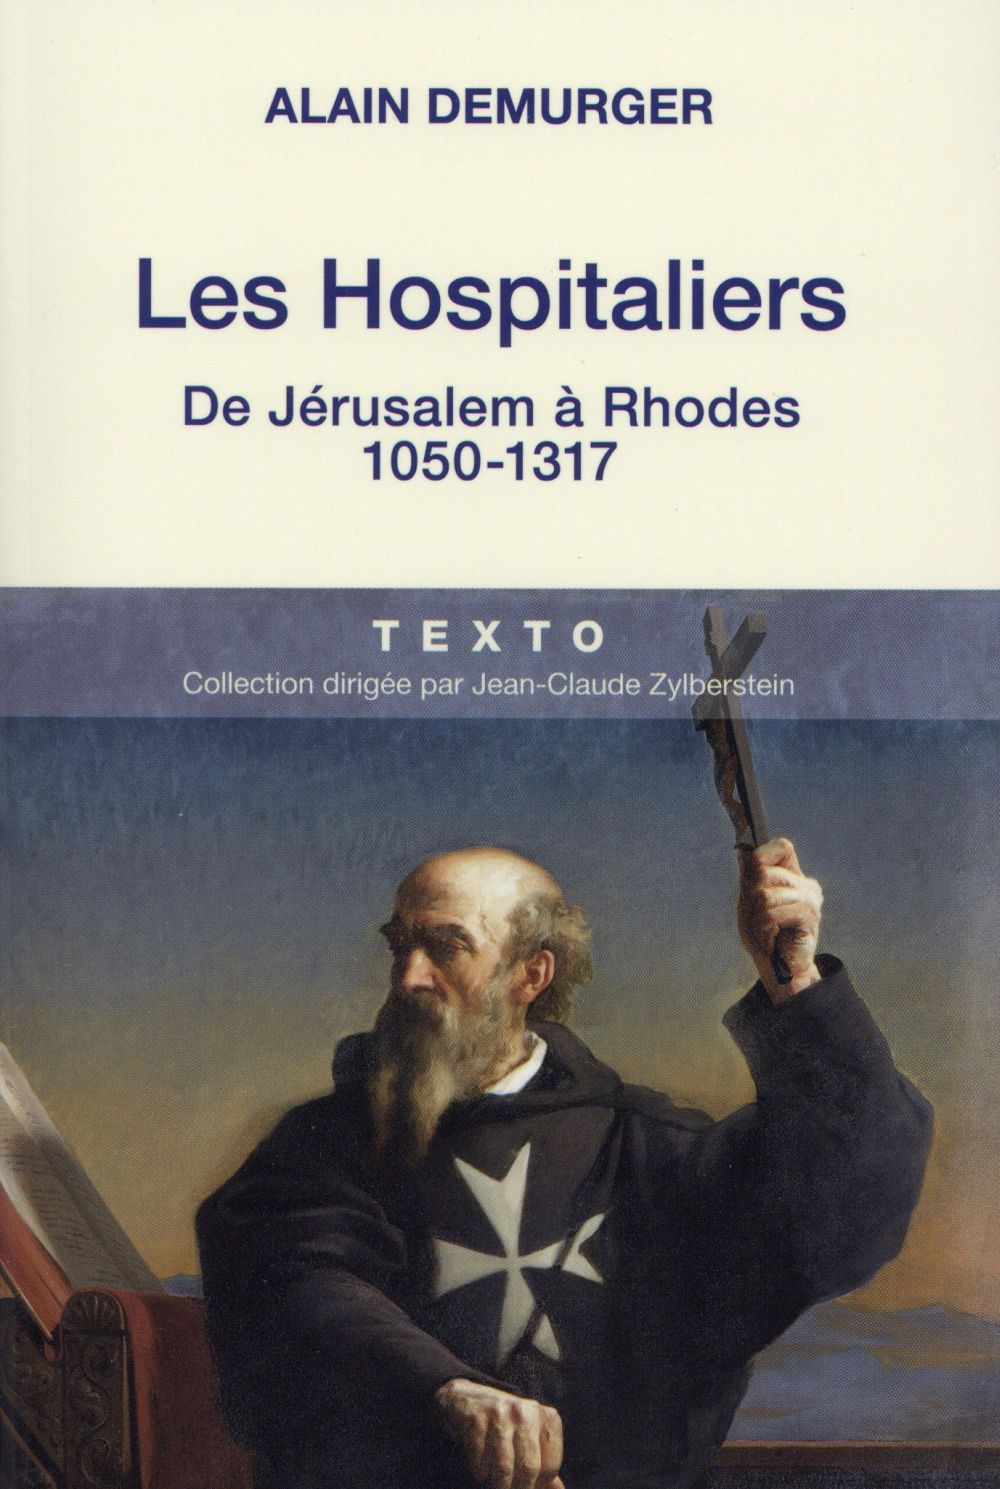 LES HOSPITALIERS DE JERUSALEM A RHODES, 1050-1317 Demurger Alain Tallandier